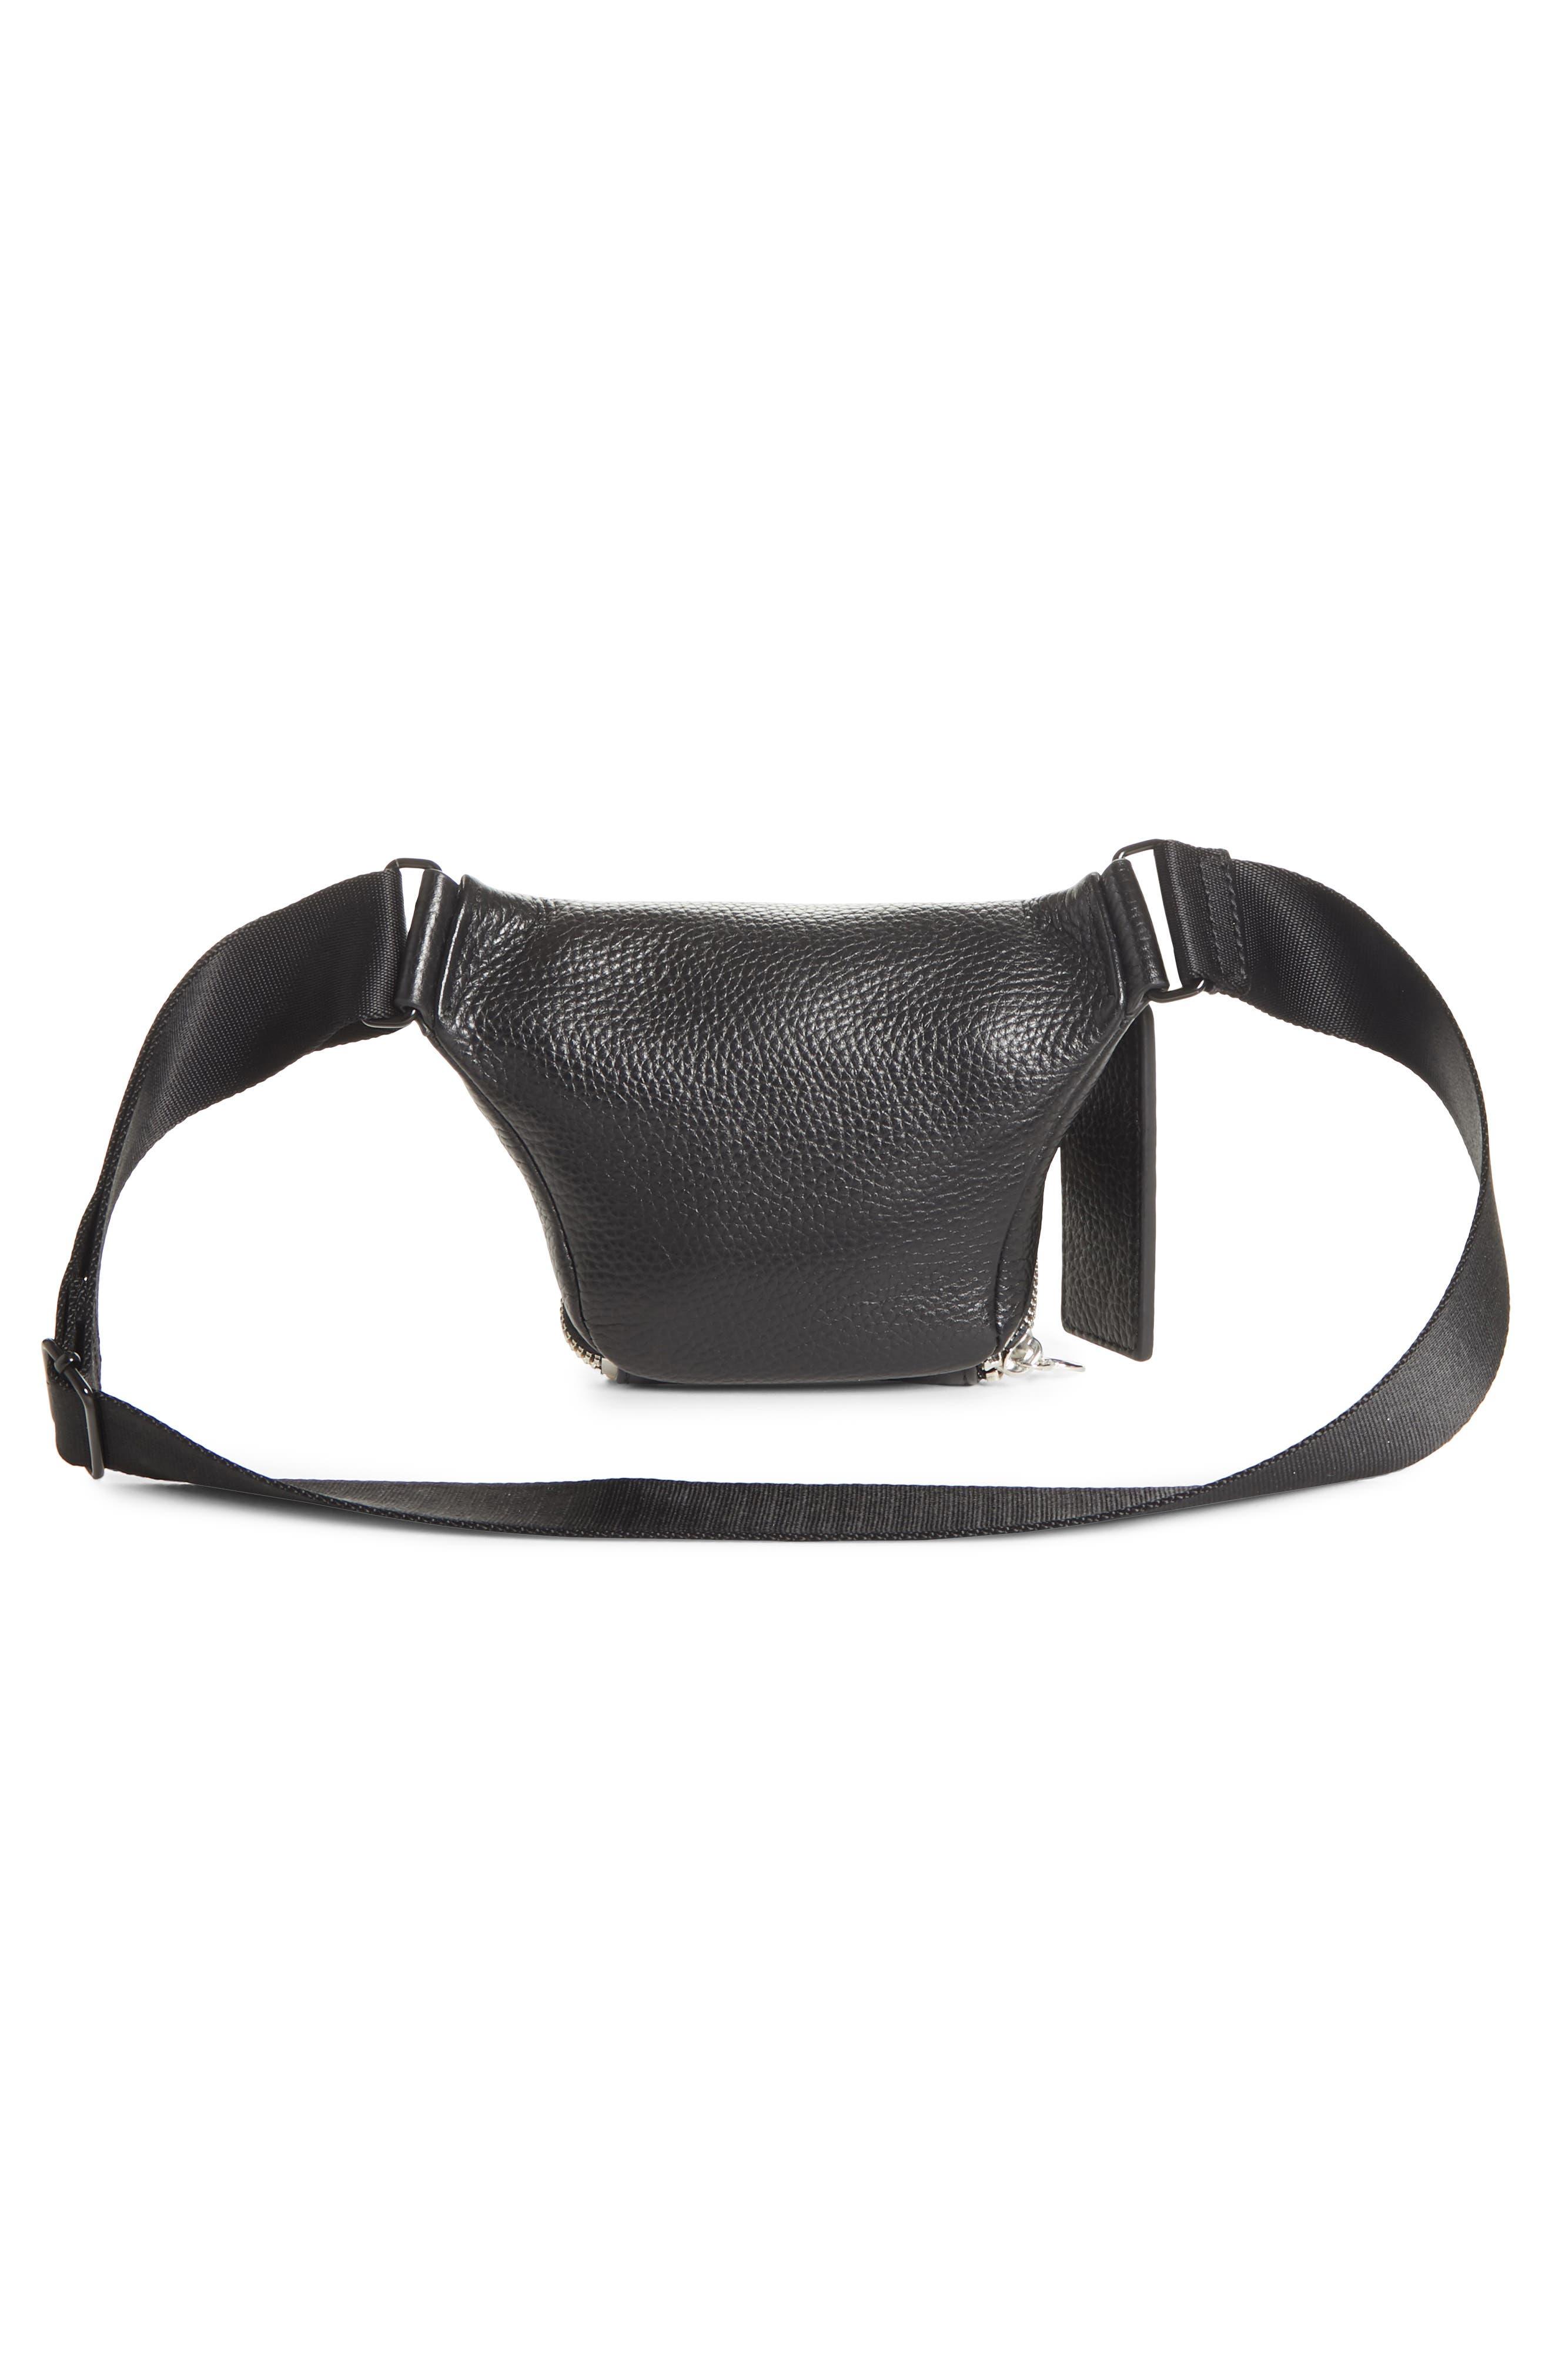 Leather Bum Bag,                             Alternate thumbnail 3, color,                             BLACK